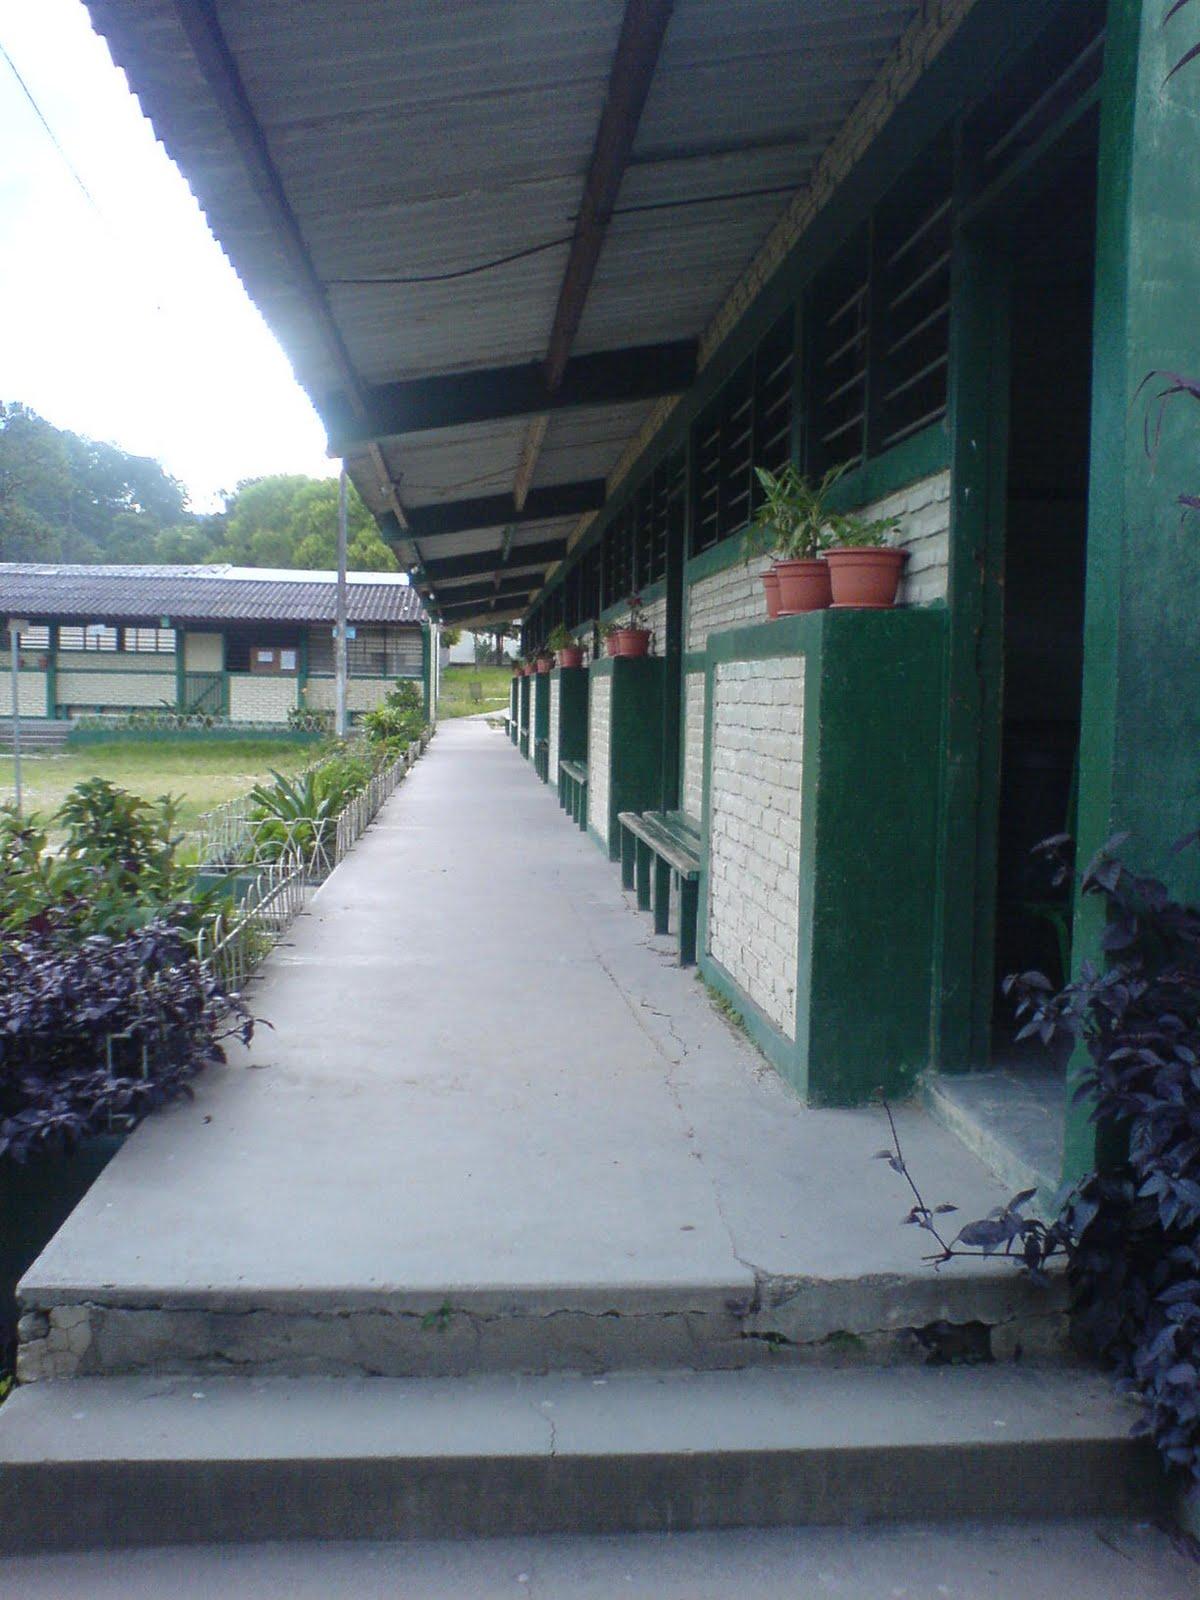 Edificios del Instituto Tecnico de Minas de Oro